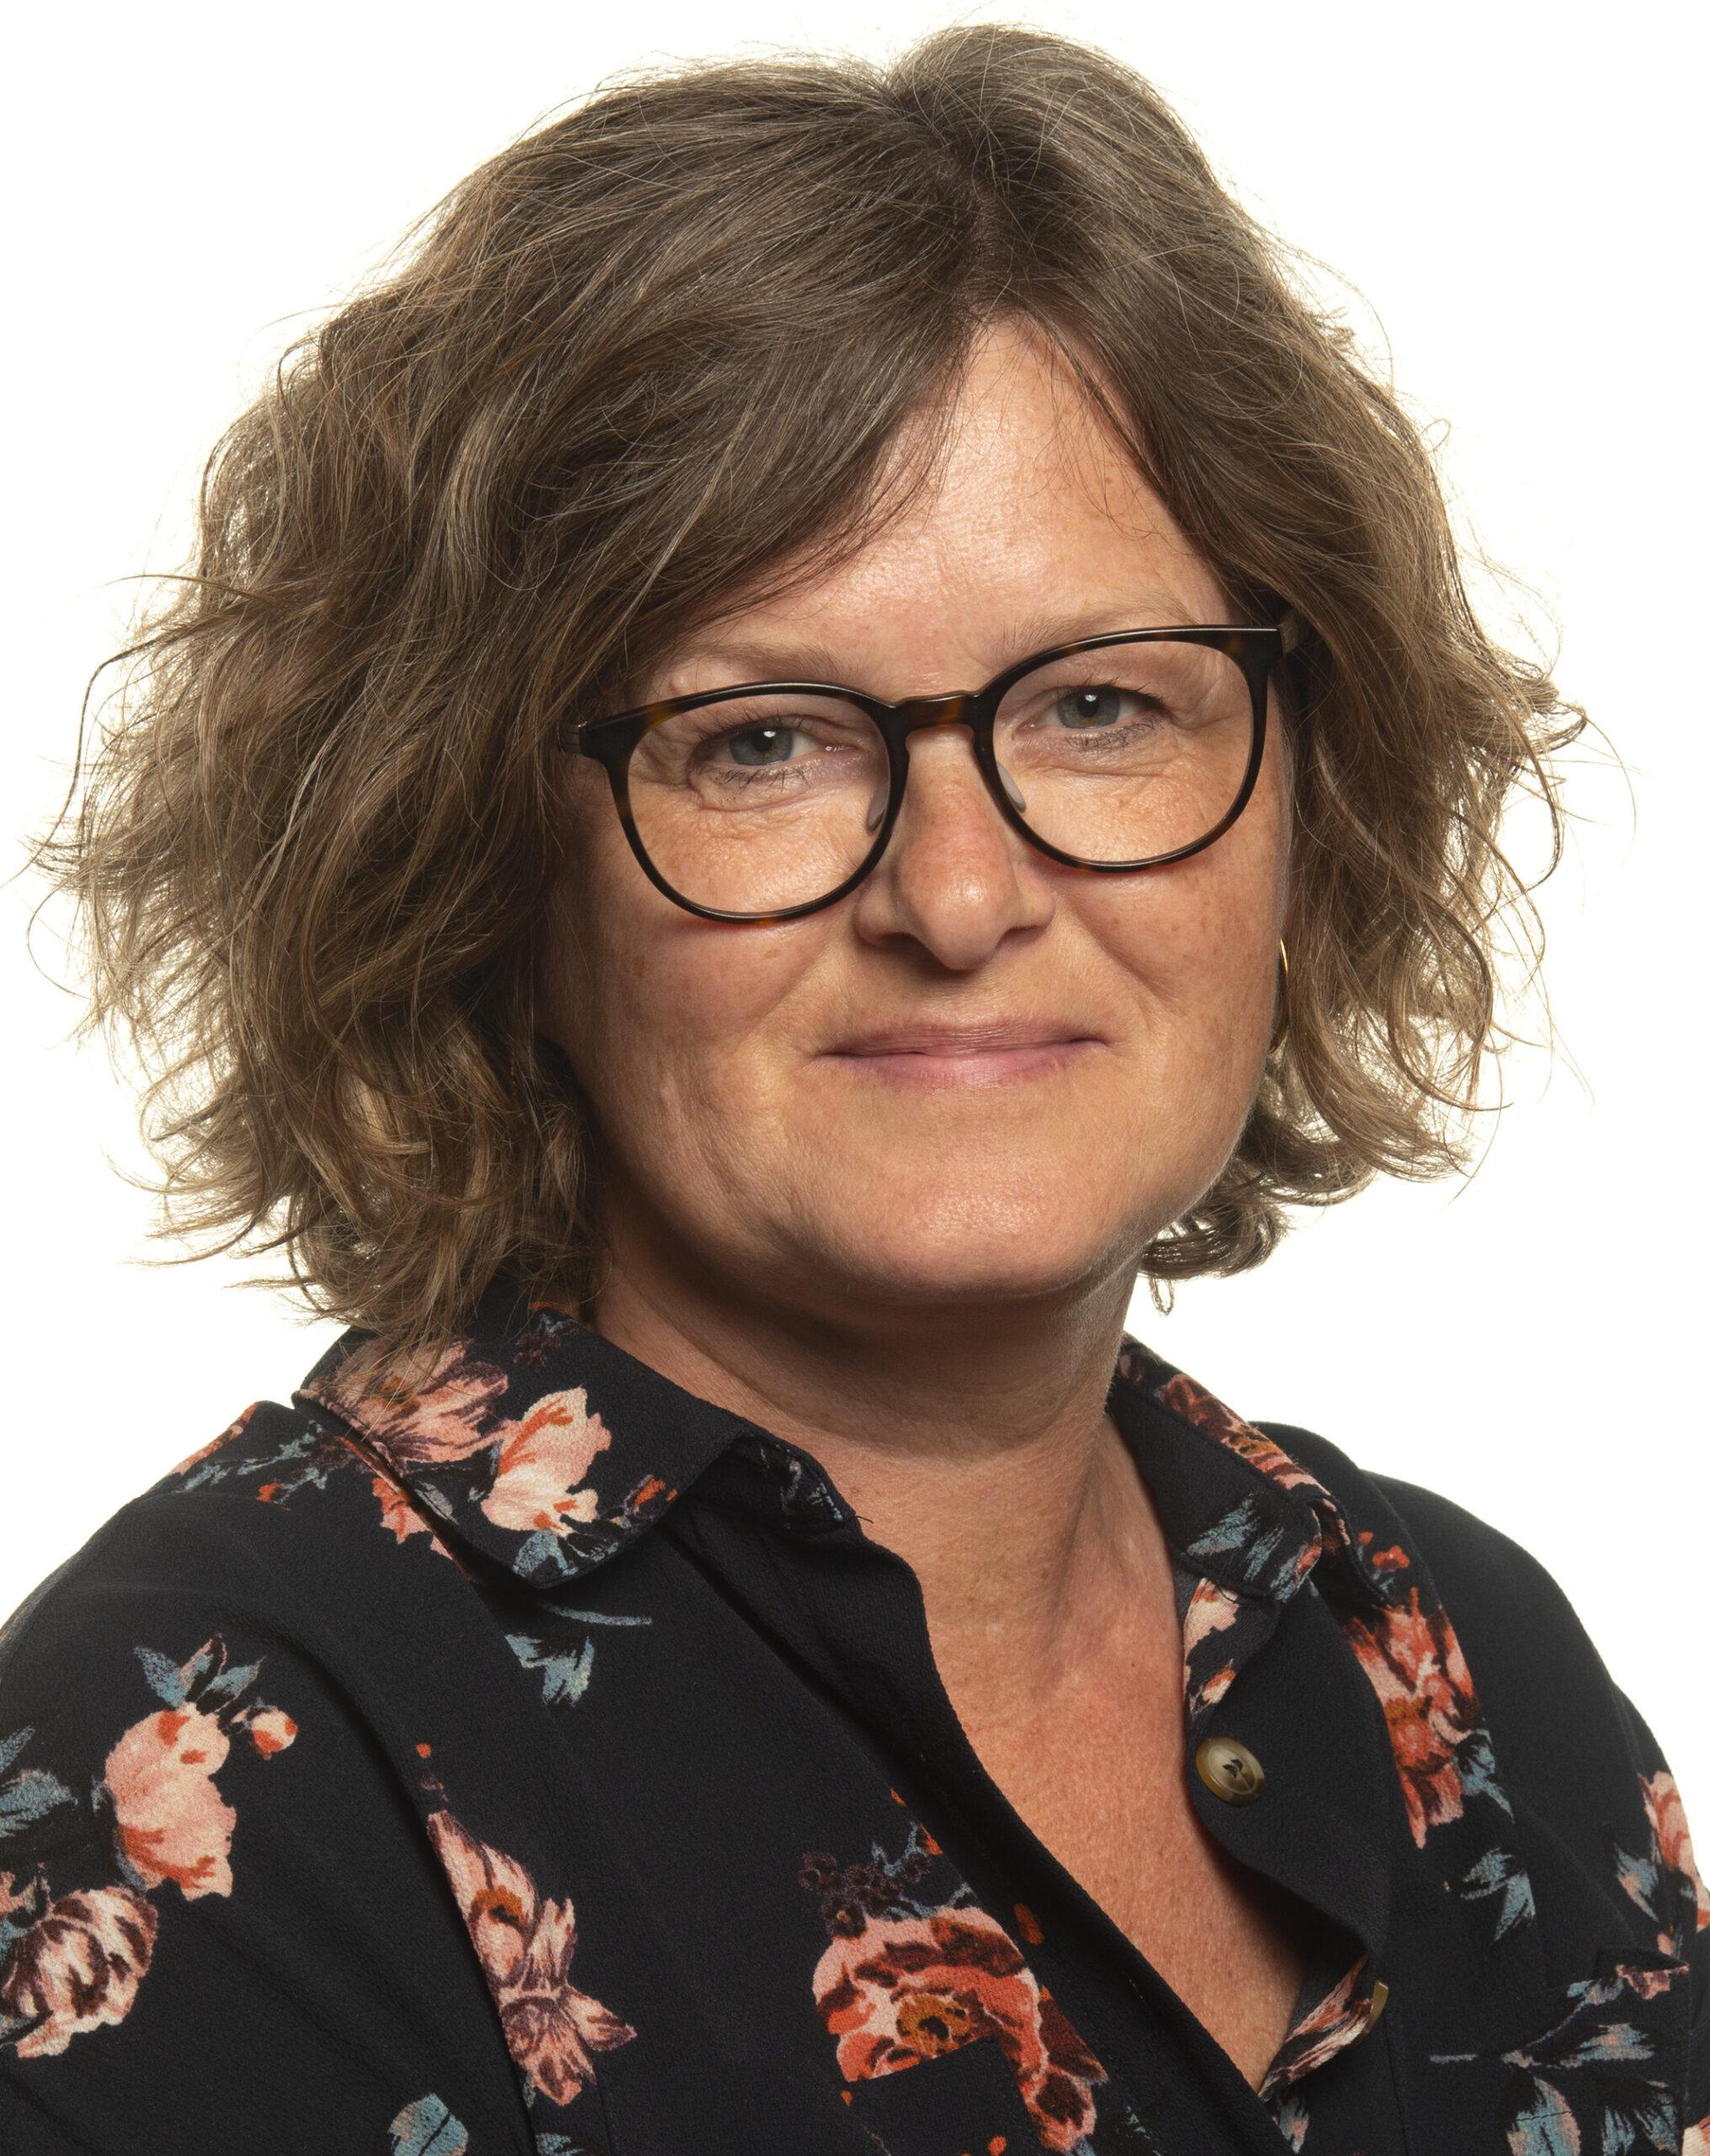 Charlotte Lynggaard Jensen